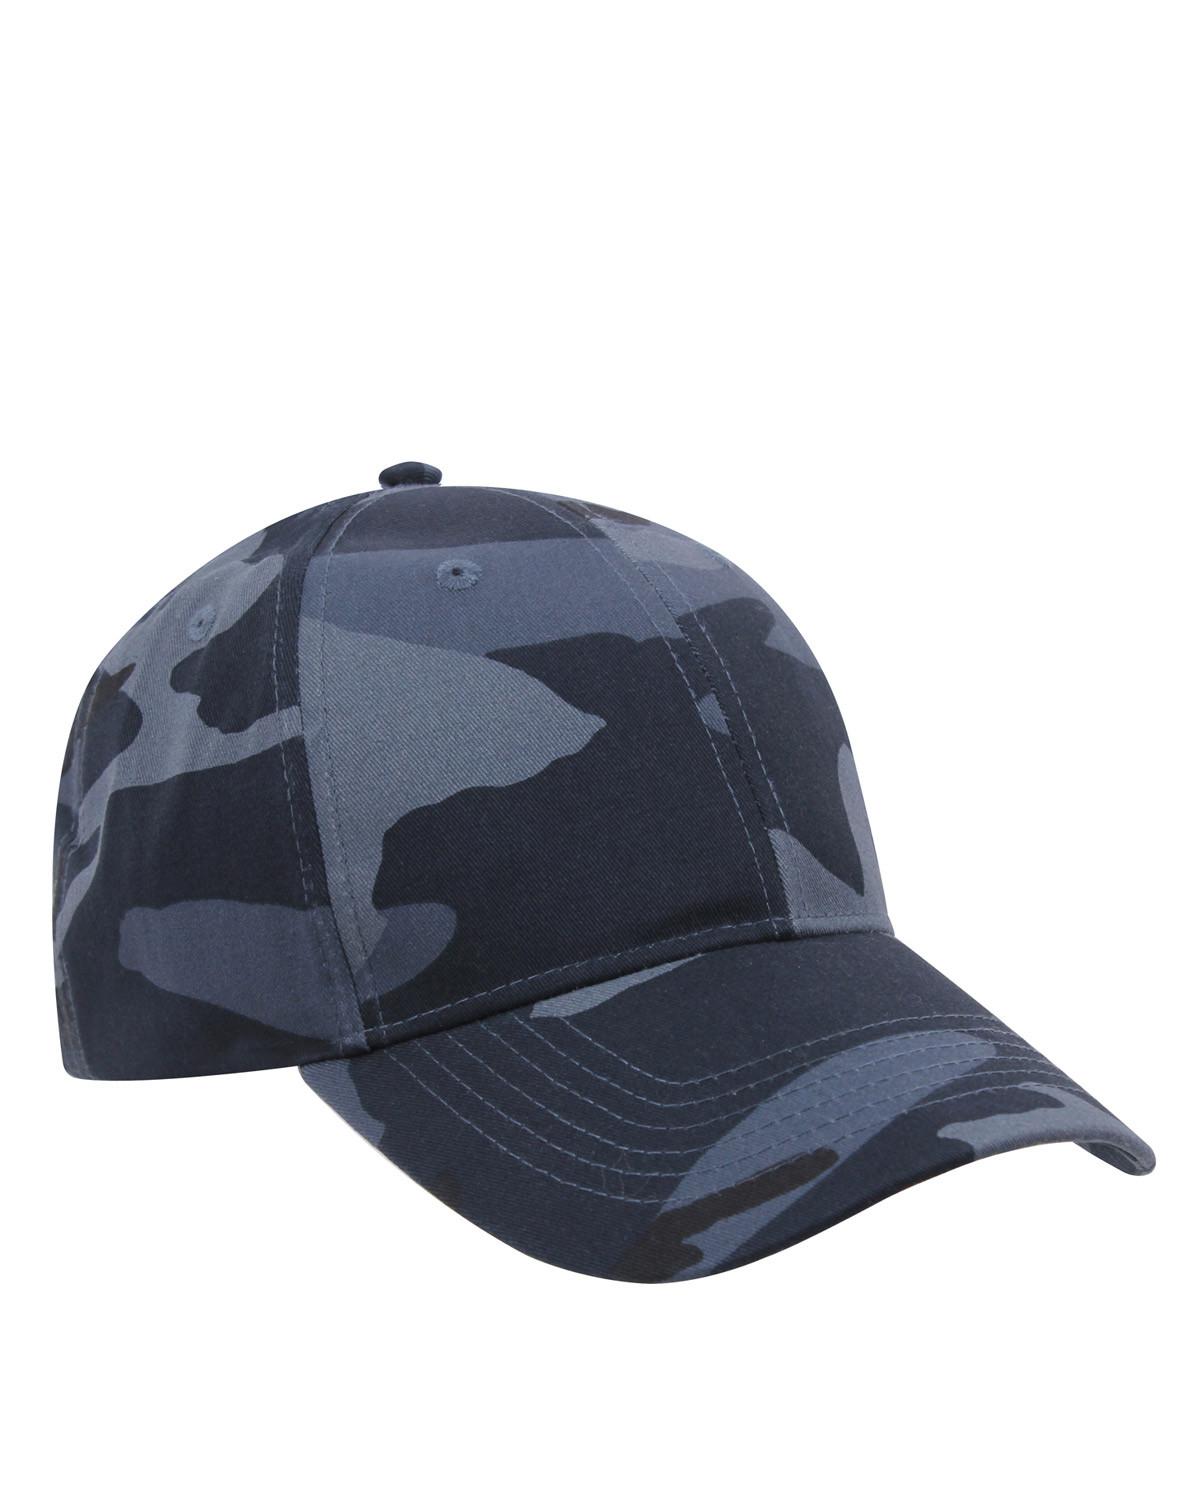 Rothco Cap (Midnight Blue Camo, One Size)